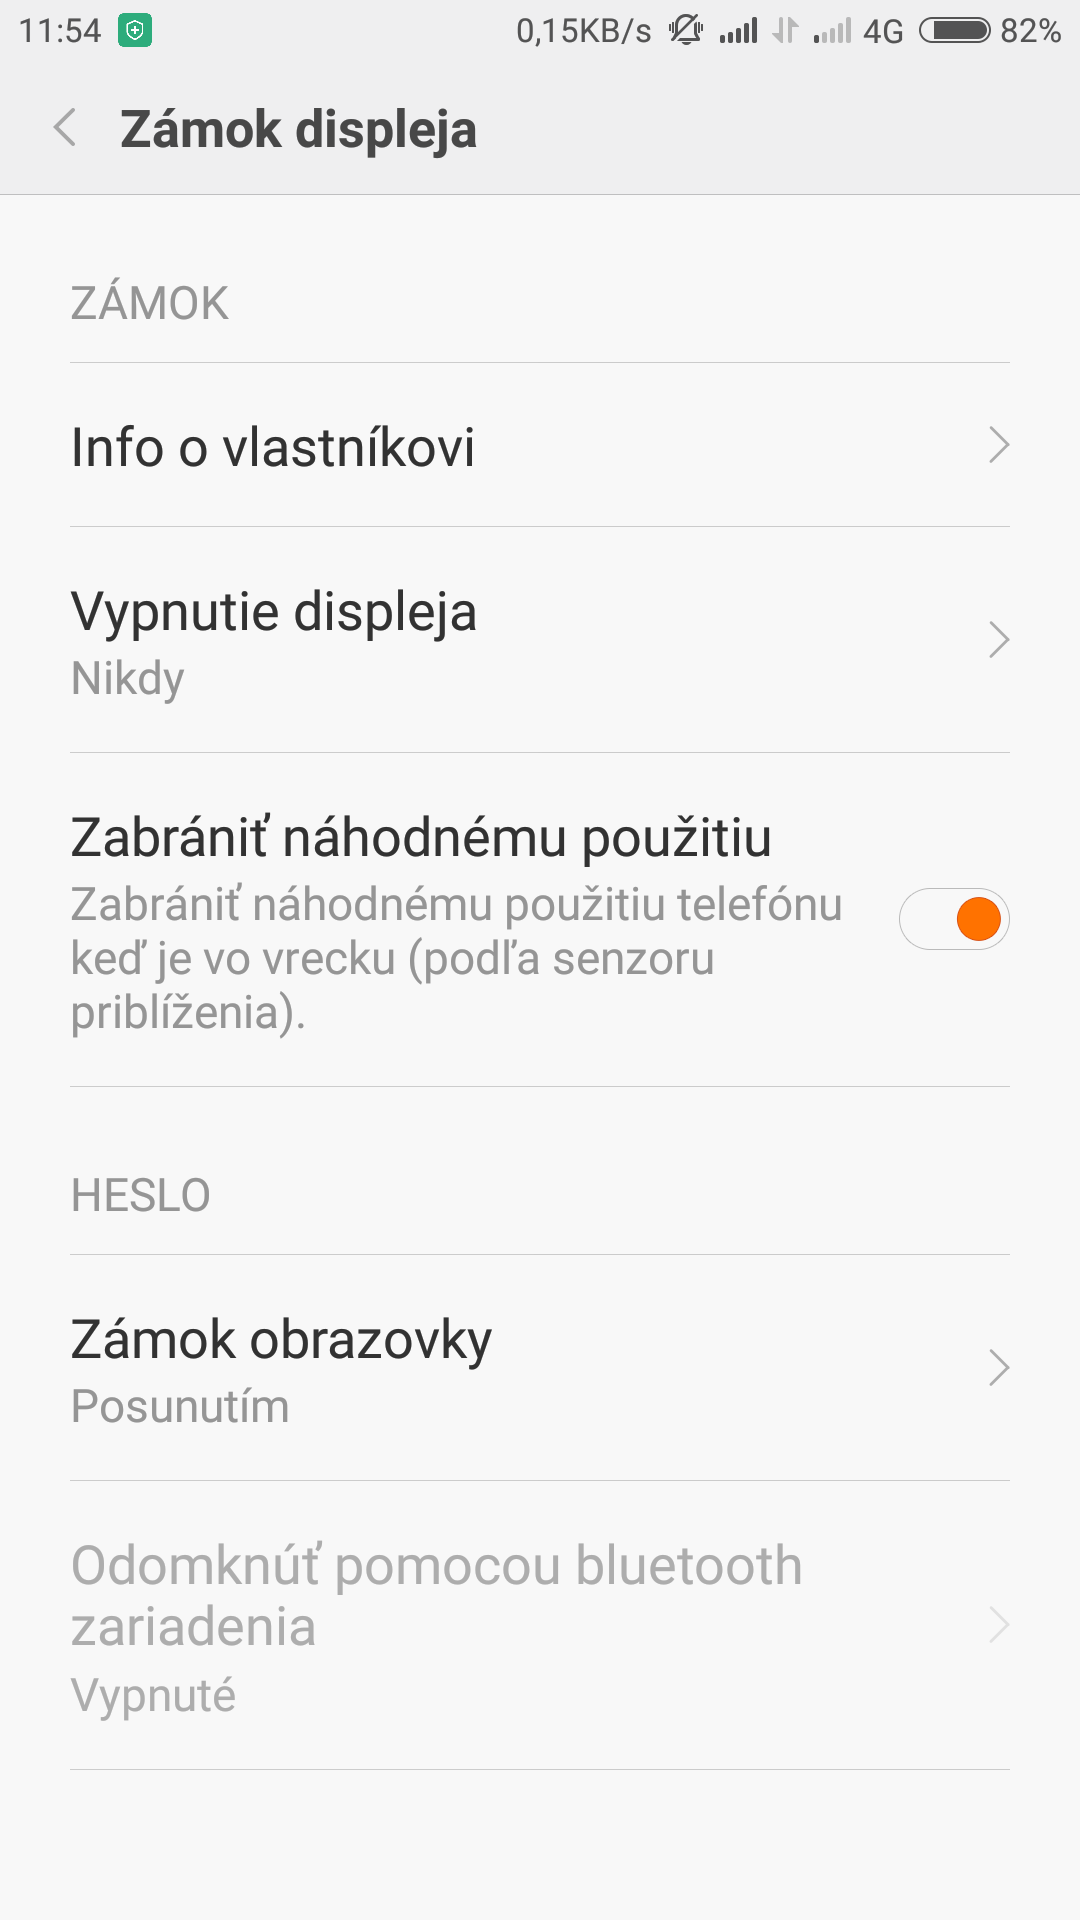 Screenshot_com.android.settings_2015-09-27-11-54-08